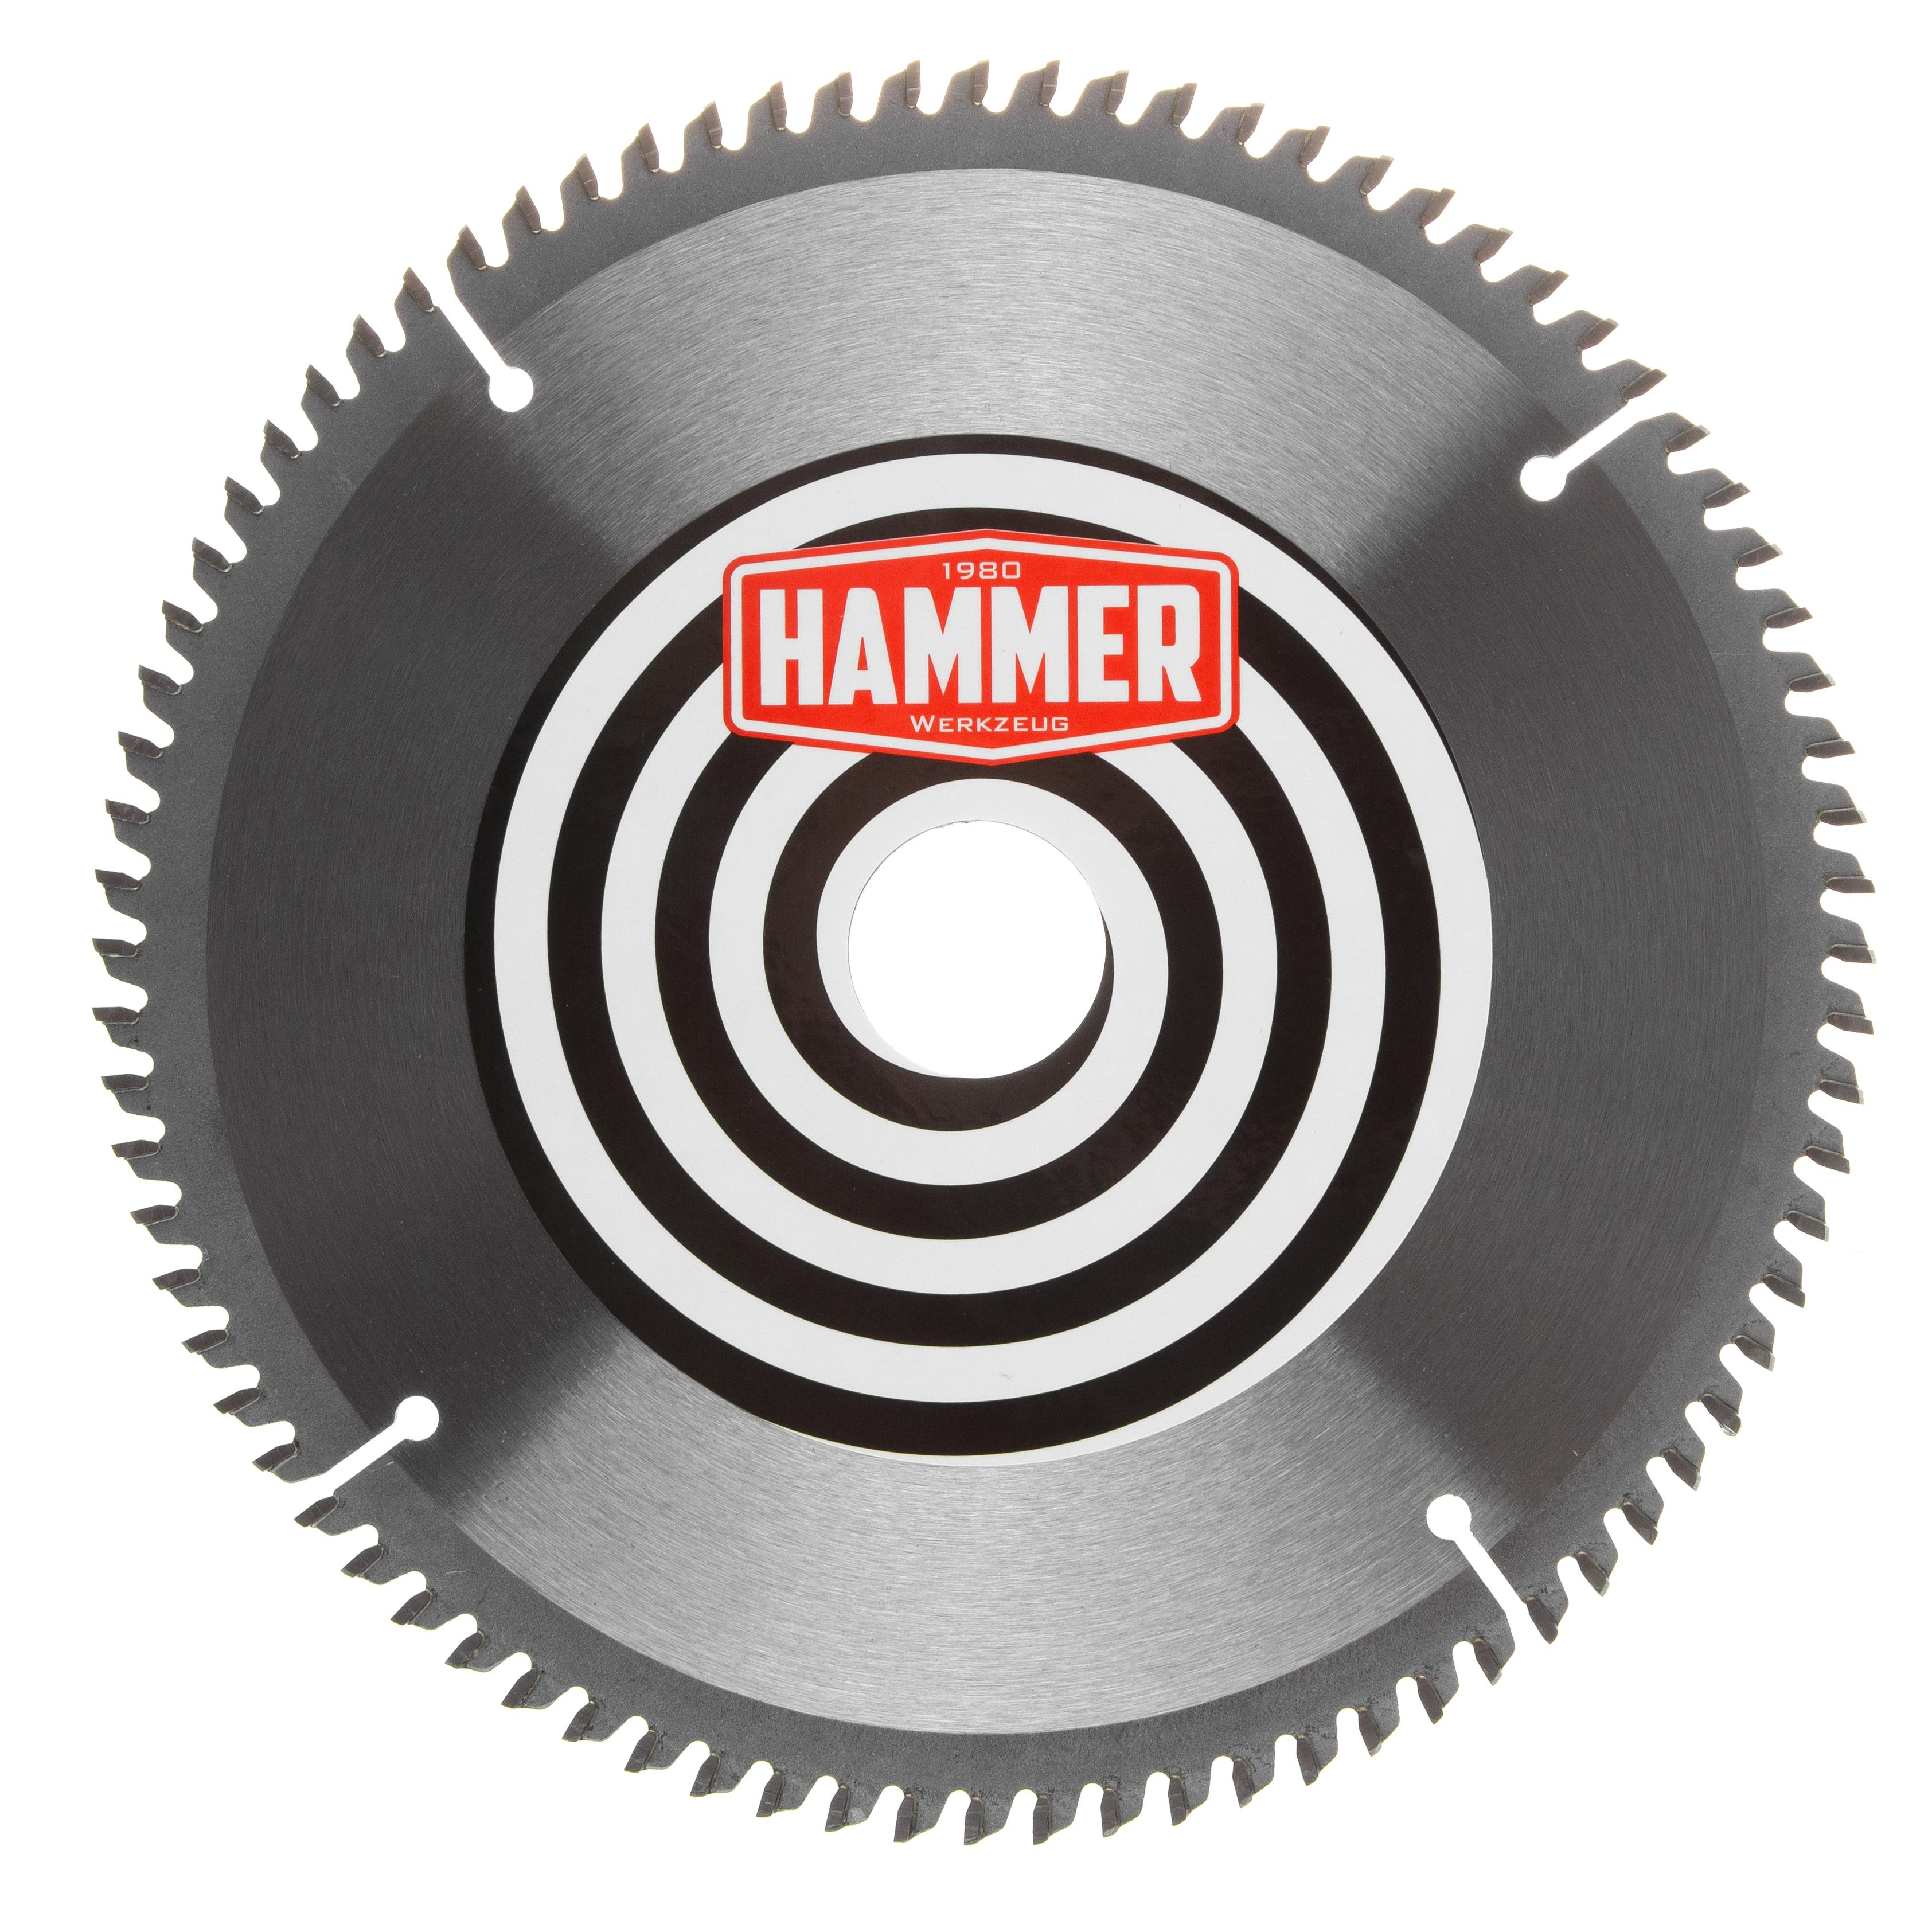 Диск пильный твердосплавный Hammer 210х30/20мм 80 зуб. цены